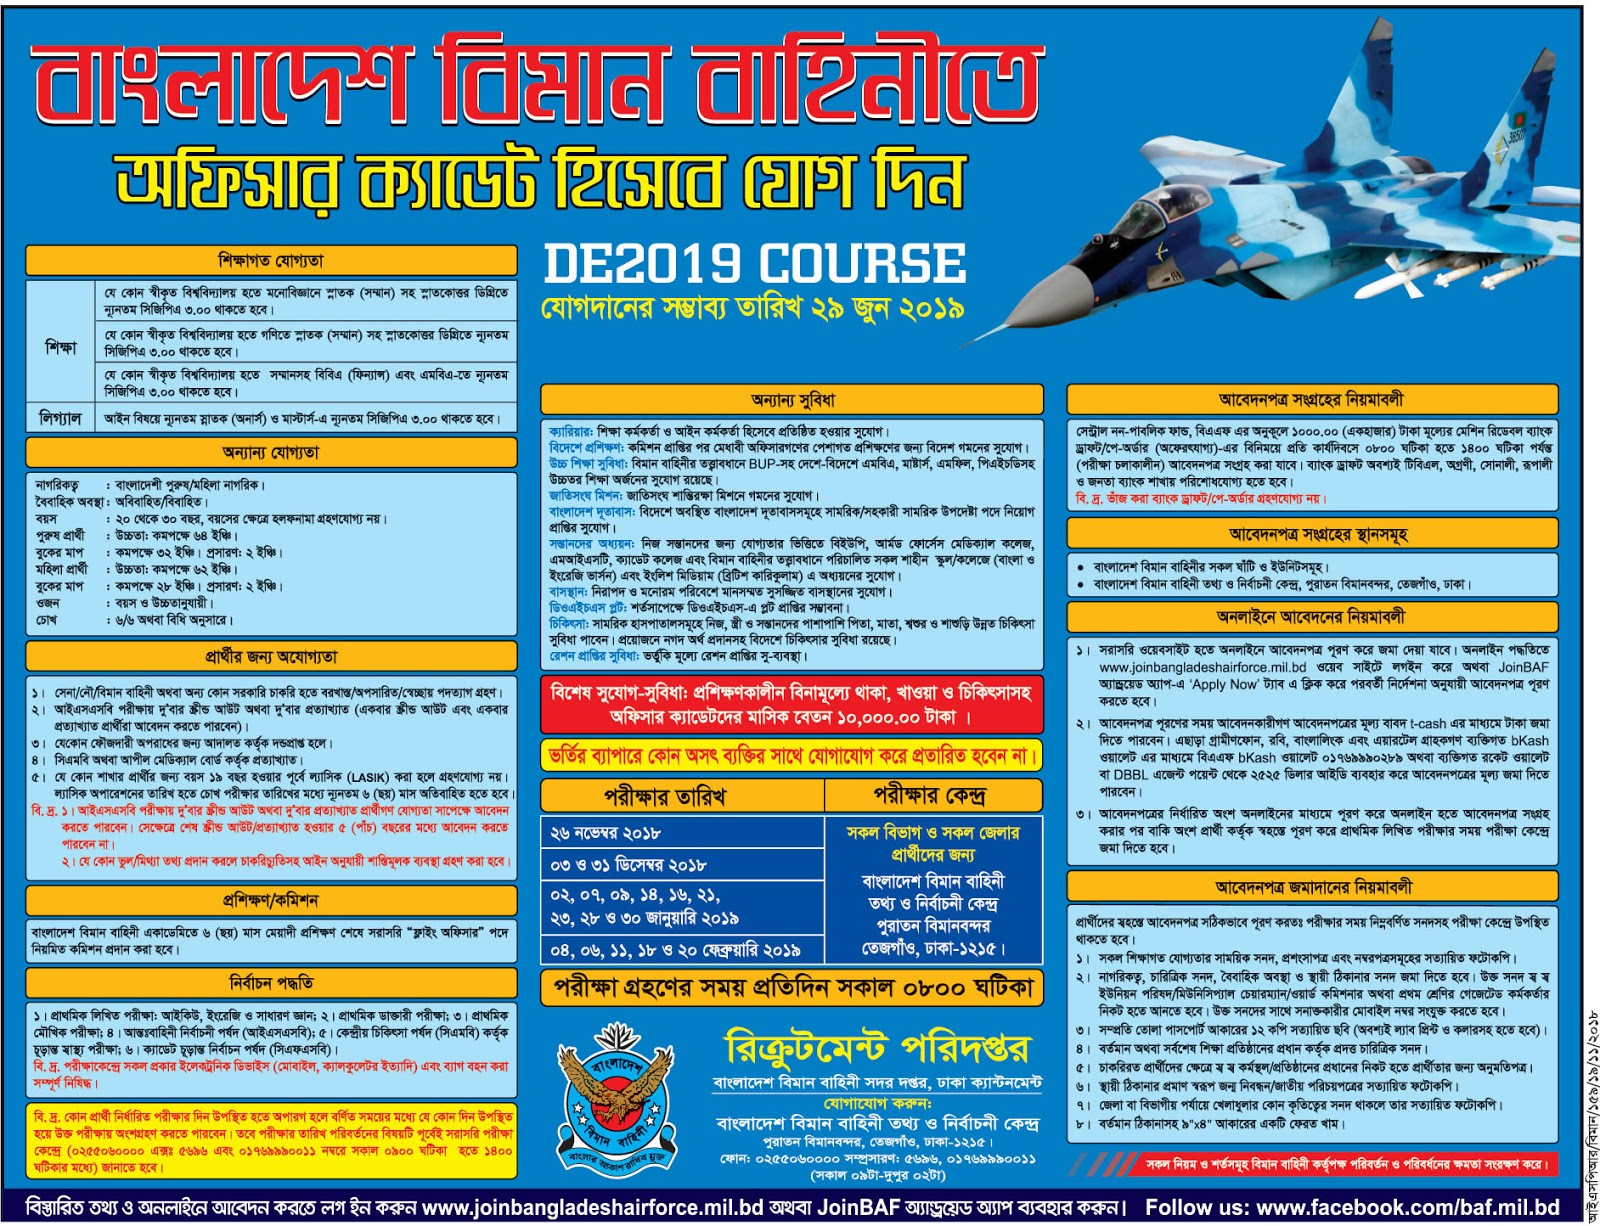 Bangladesh Air Force Officer Cadet DE2019 Course Recruitment Circular 2018